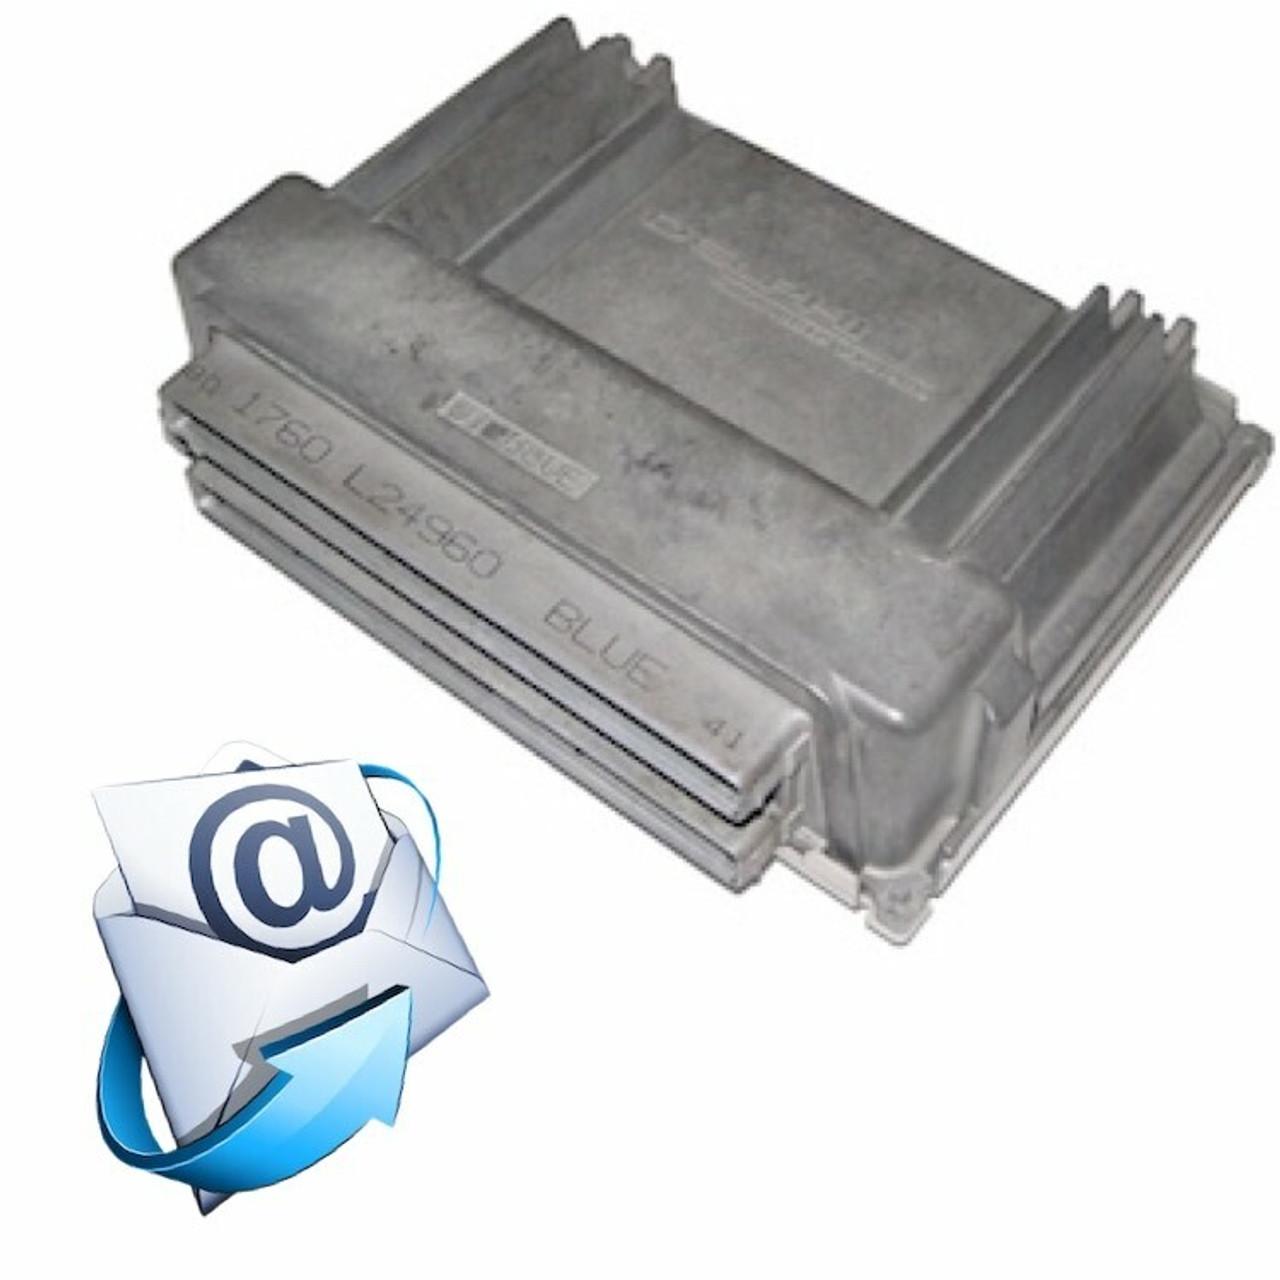 Michigan Motorsports Email Tune for use with HP Tuners 4.8 5.3 5.7 6.0 6.2 LS1 LS6 LS2 LS3 LQ4 LQ9 LM4 L33 L59 LR4 LM7